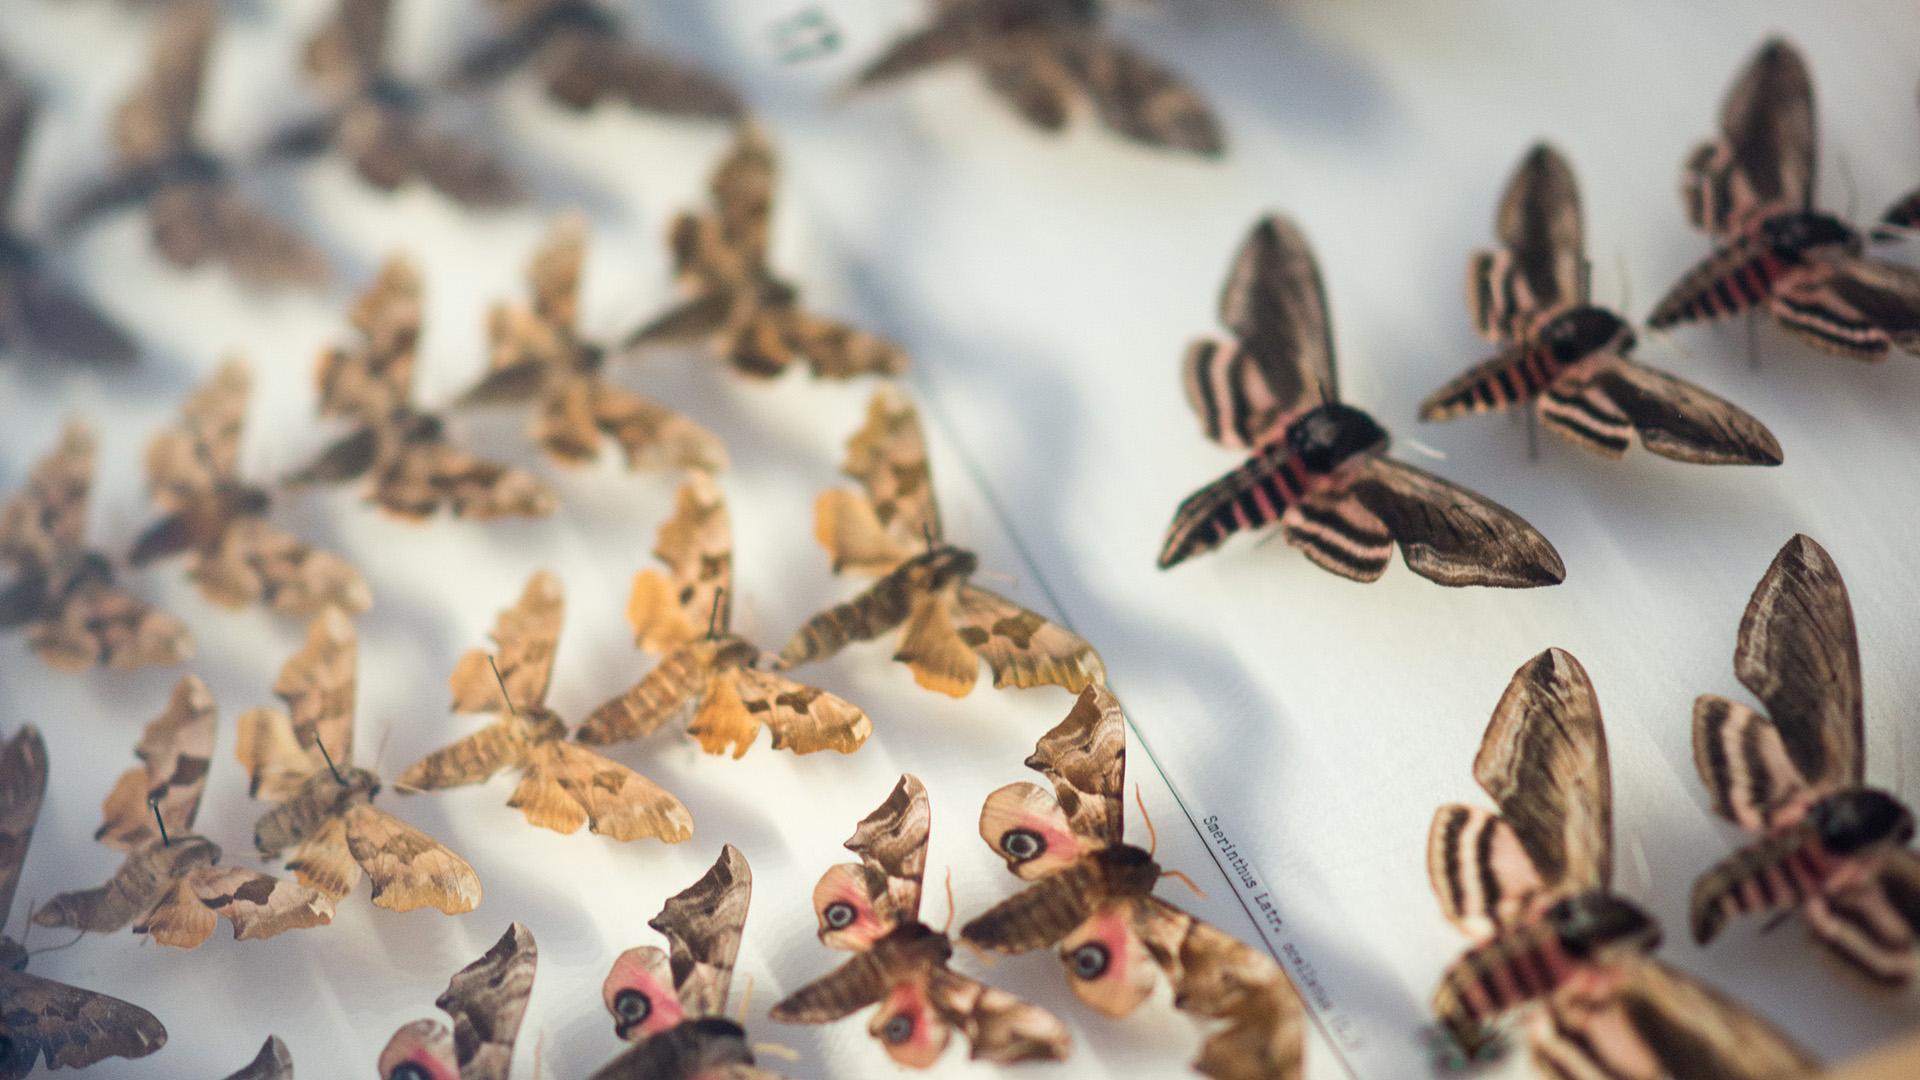 Sphinx moths in display box in Armas Järvelä's Lepidoptera Collection.